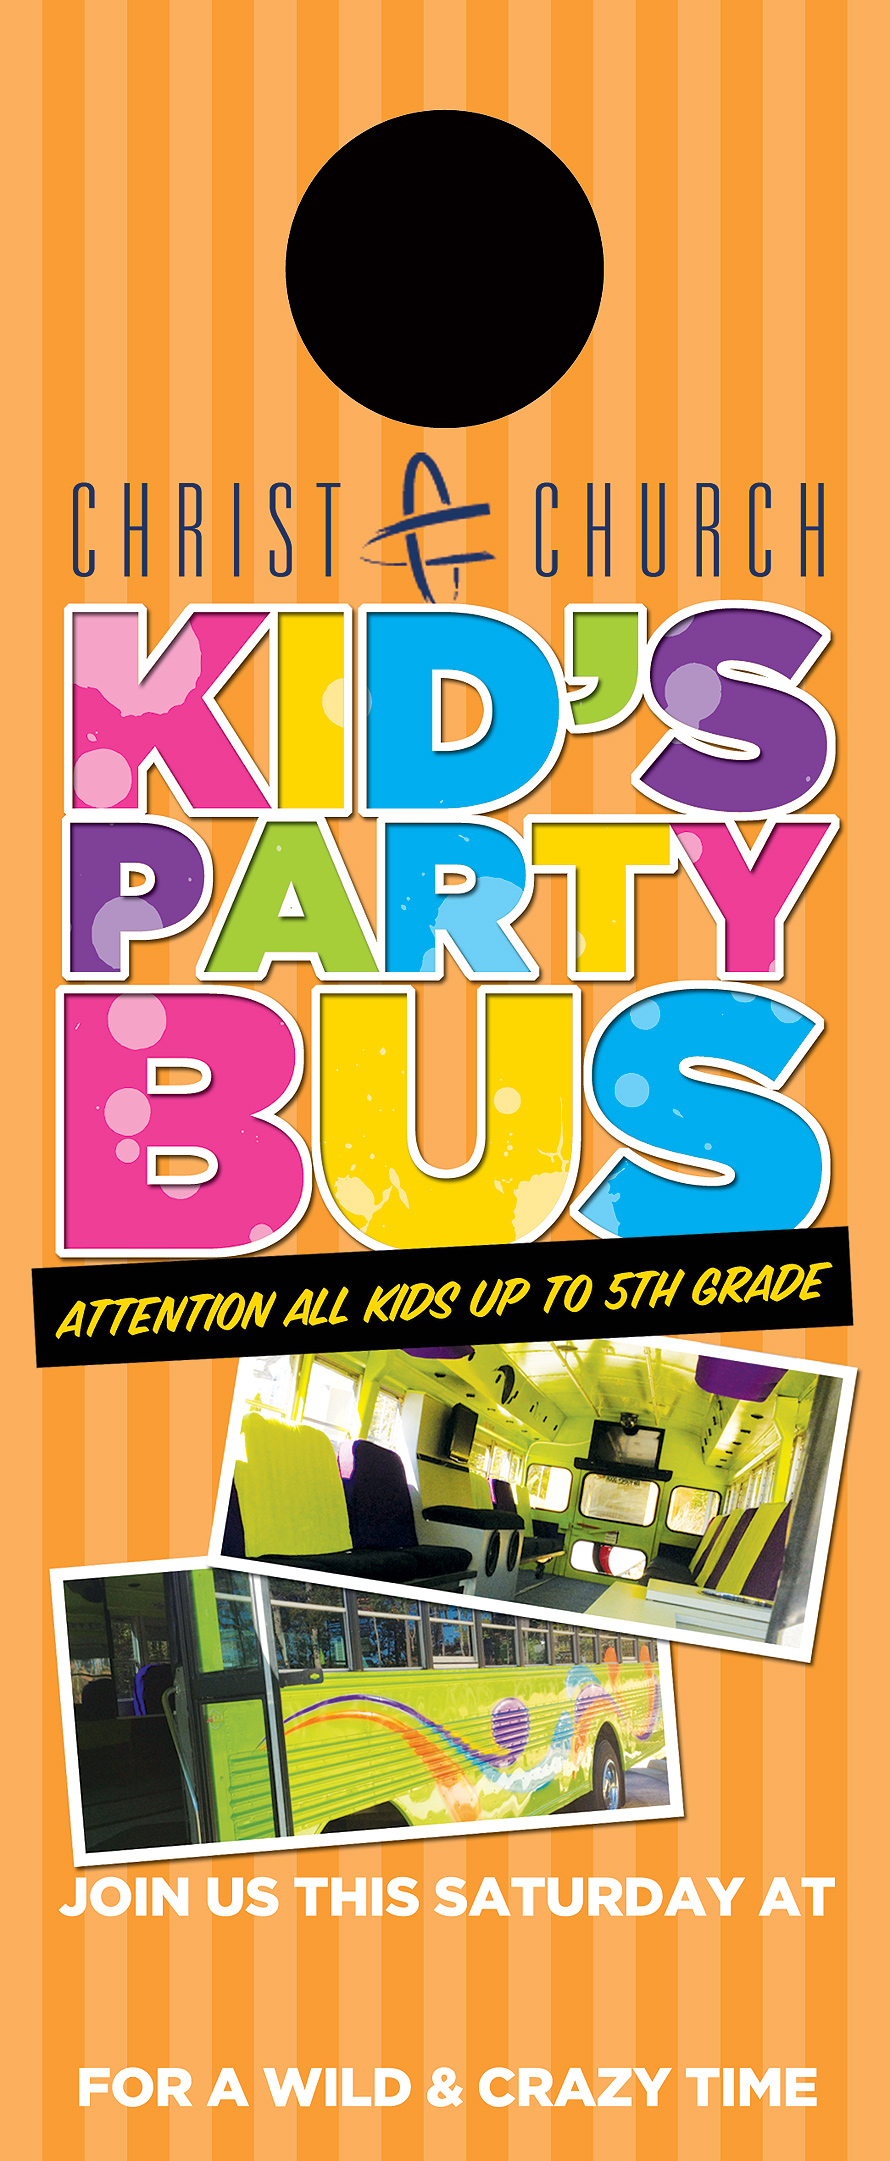 Christ Church Kid's Party Bus